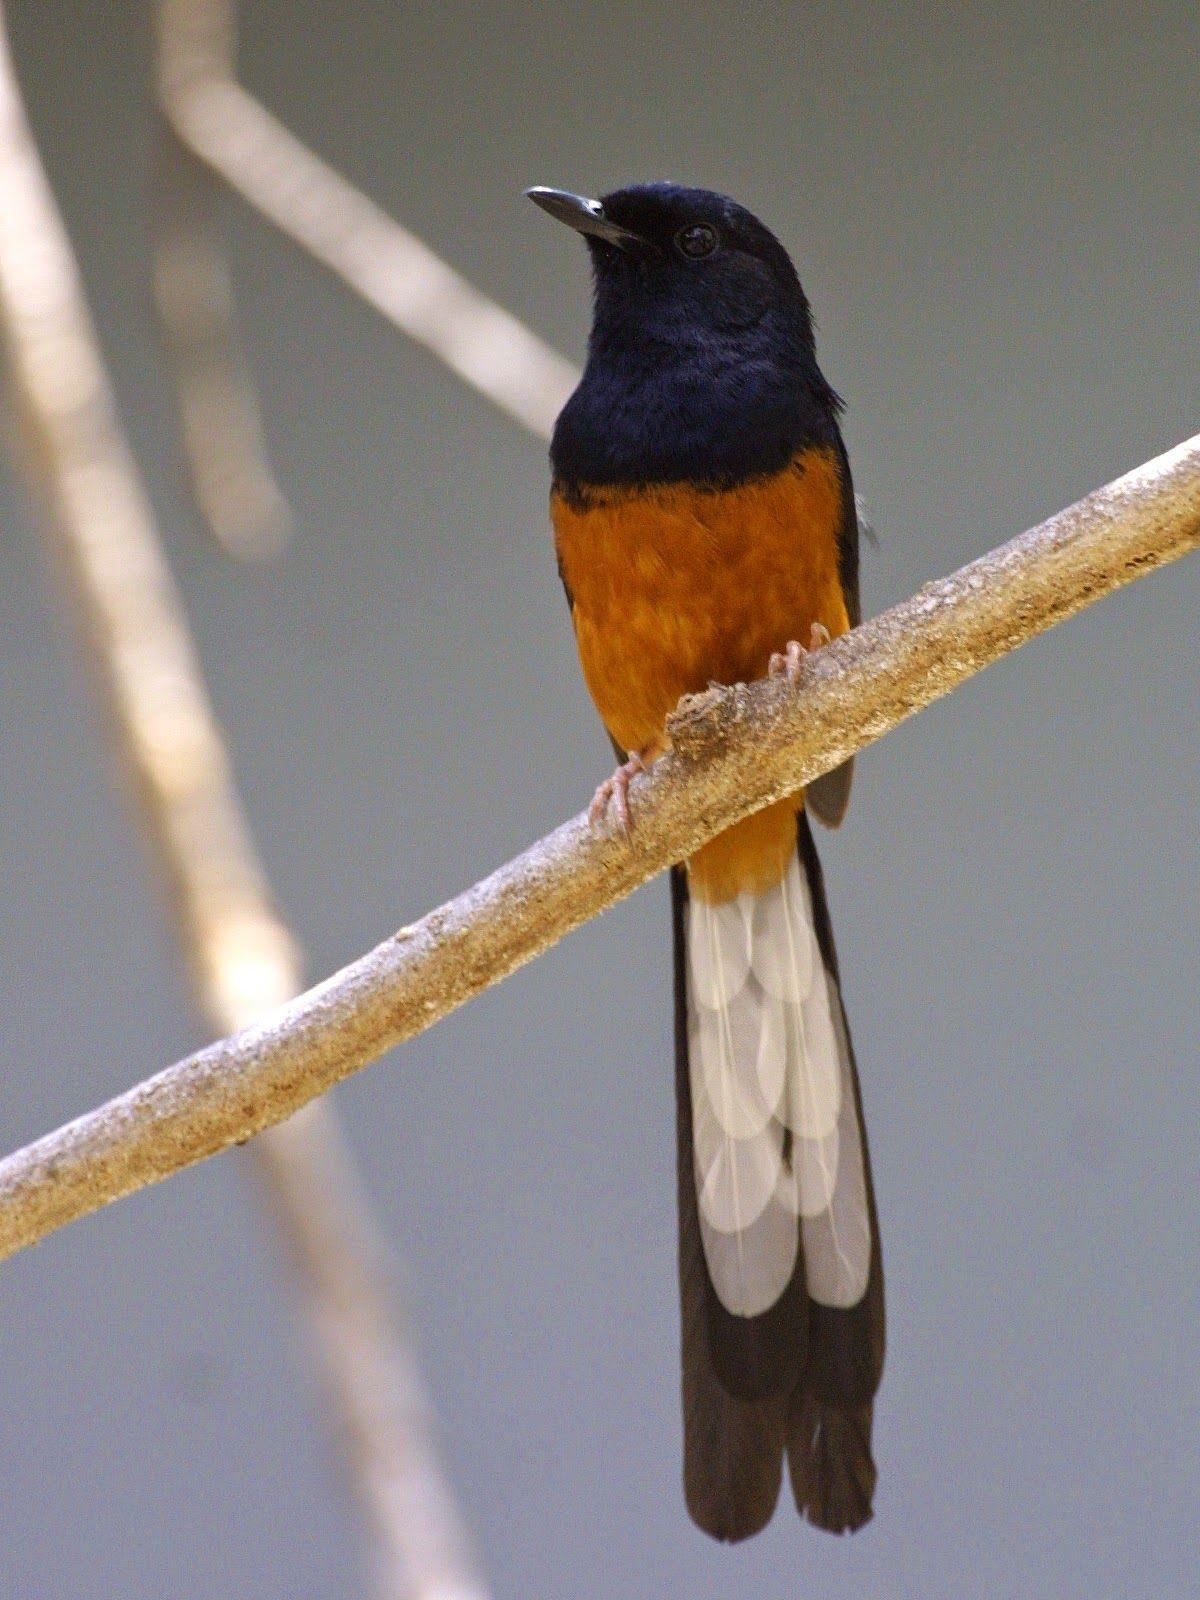 Kisaran Harga Burung Murai Tahun 2015 Burung Master Burung Murai Burung Cantik